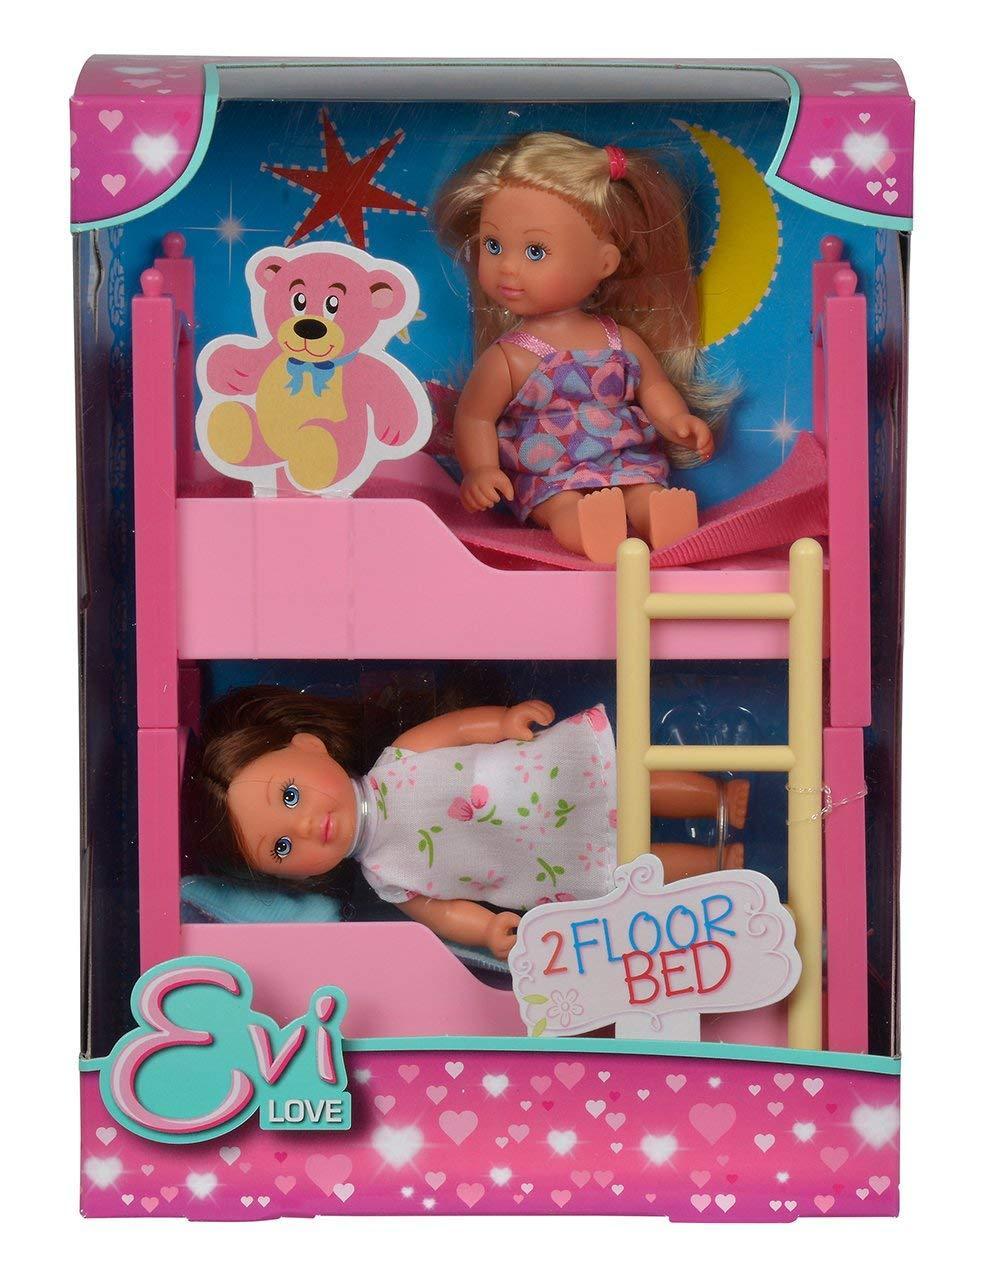 Кукла Еви и двухъярусная кровать Evi Love 2 in 1 Bunk bed with 2 dolls & bedding Simba 5733847